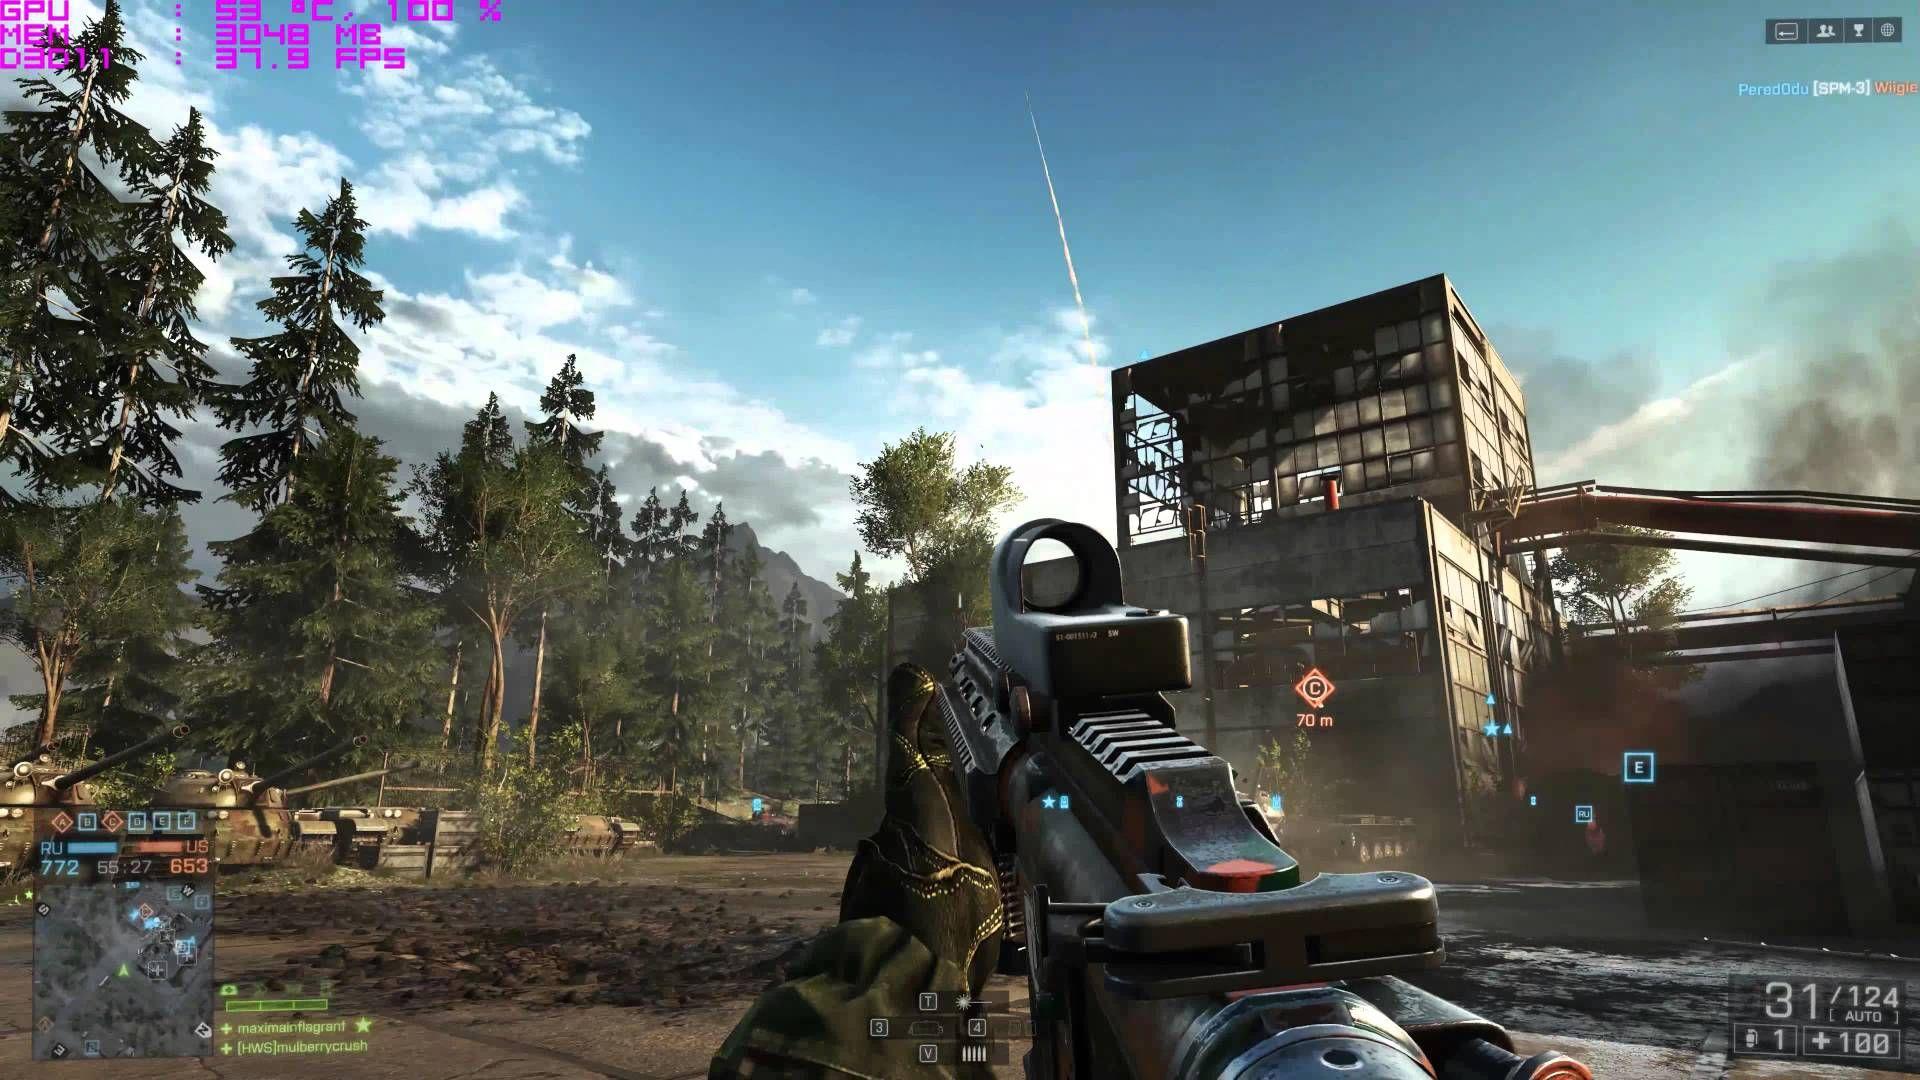 XFX Radeon R9 Fury X Battlefield 4 UHD 4K FPS Ultra Settings